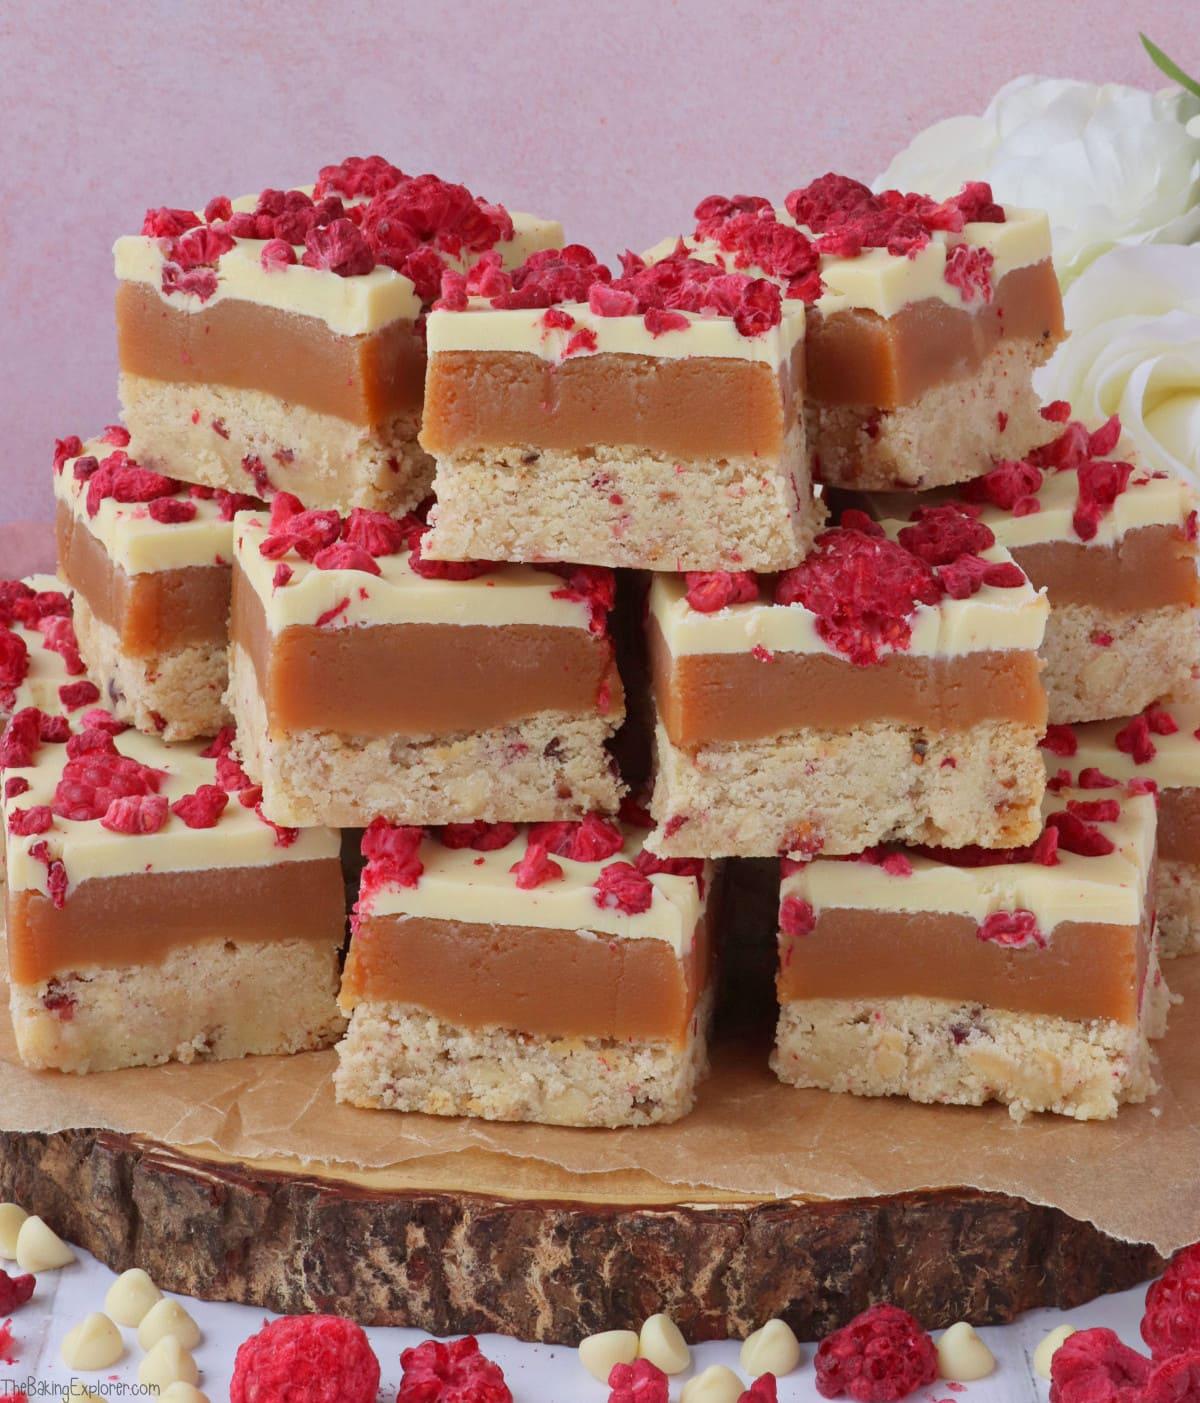 Raspberry & White Chocolate Millionaire's Shortbread